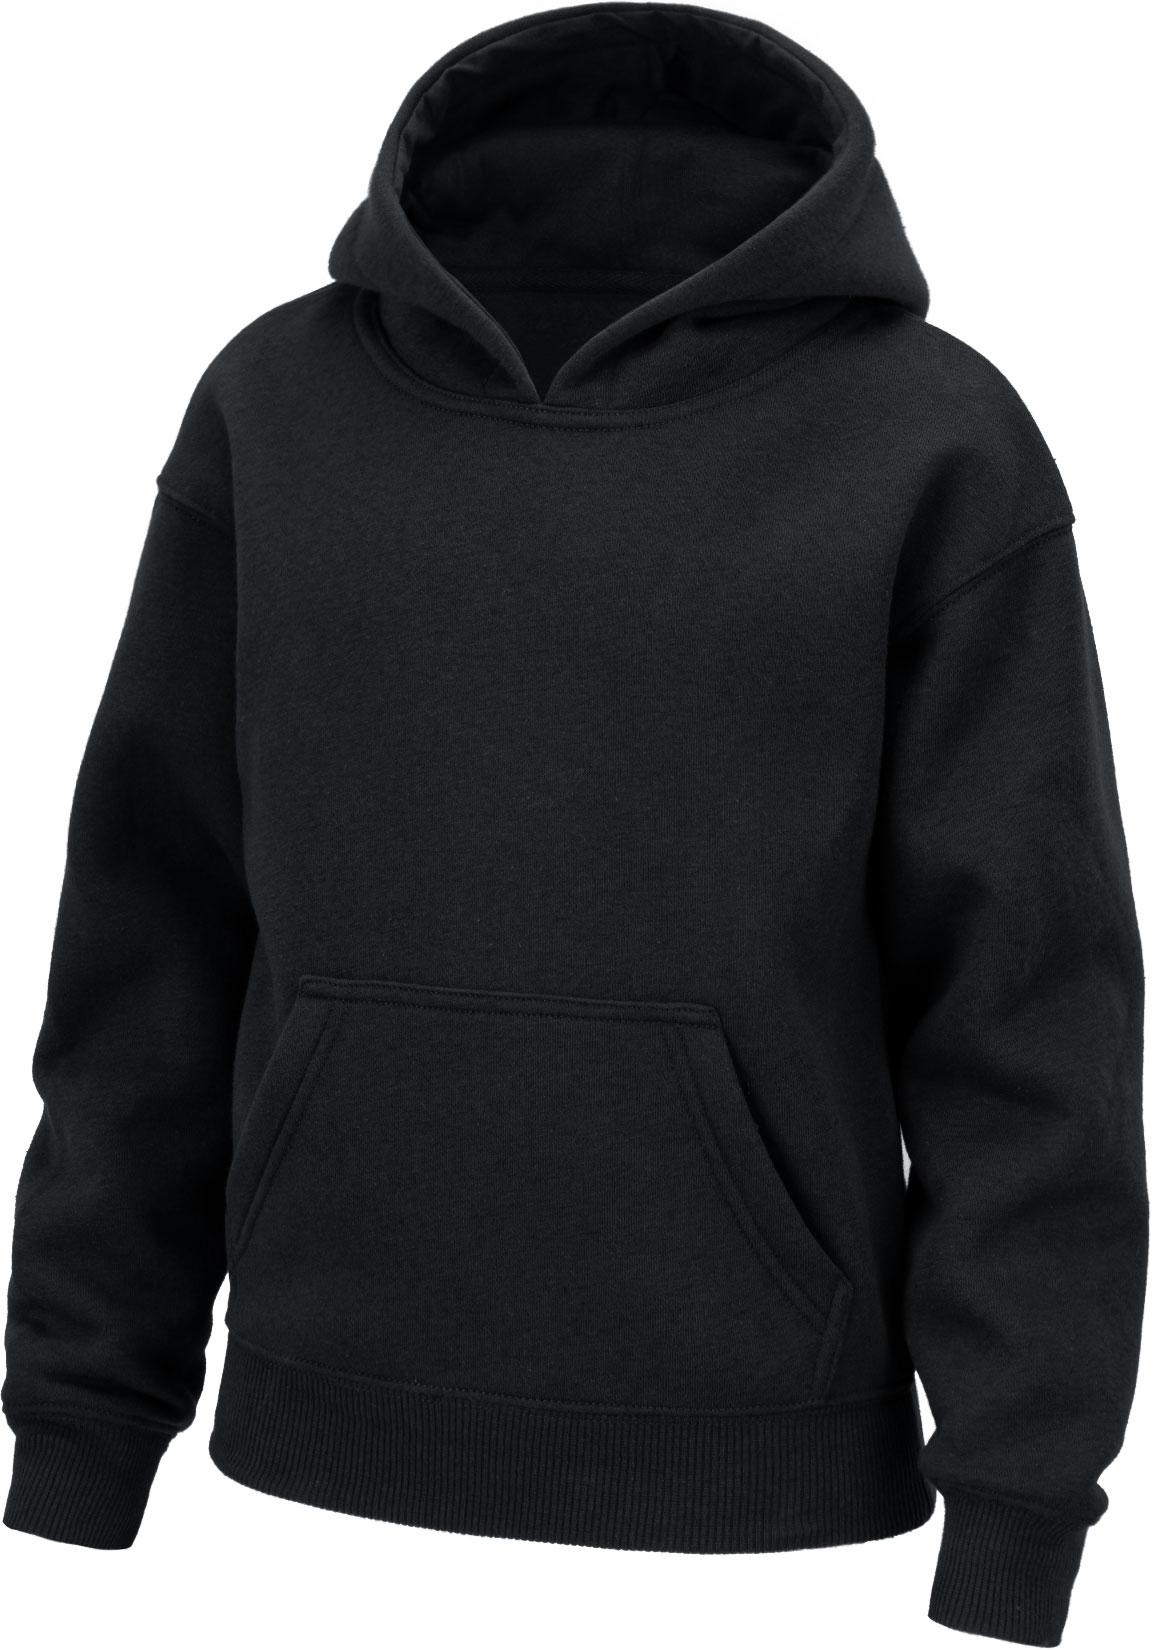 TSLA Mens Crewneck Sweatshirt Active Winter Cotton Mix Pullover Performance Fleece